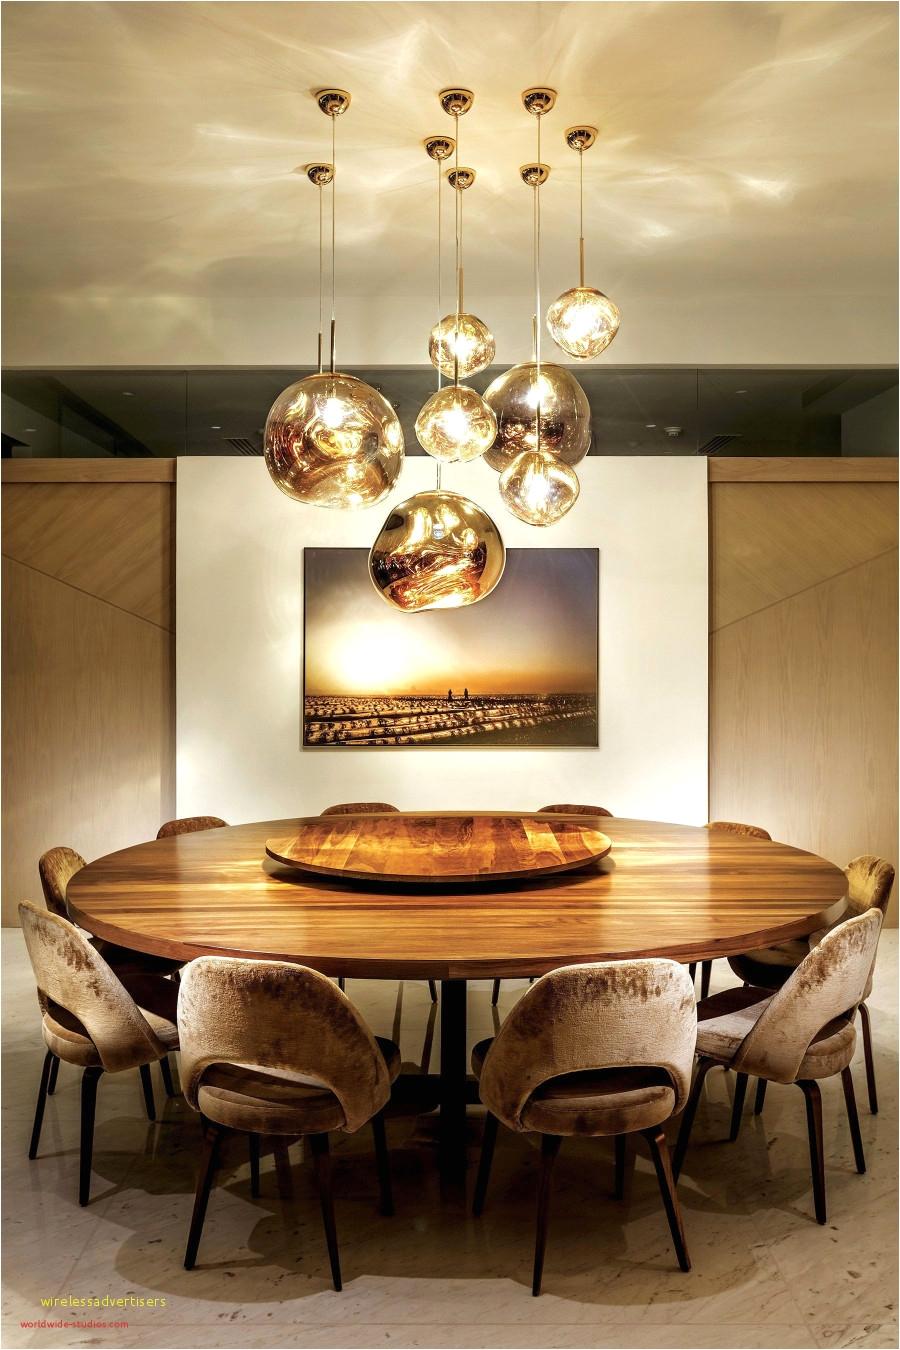 diy outdoor lighting scintillating top result diy c table lovely dinette lighting fixtures lighting 0d